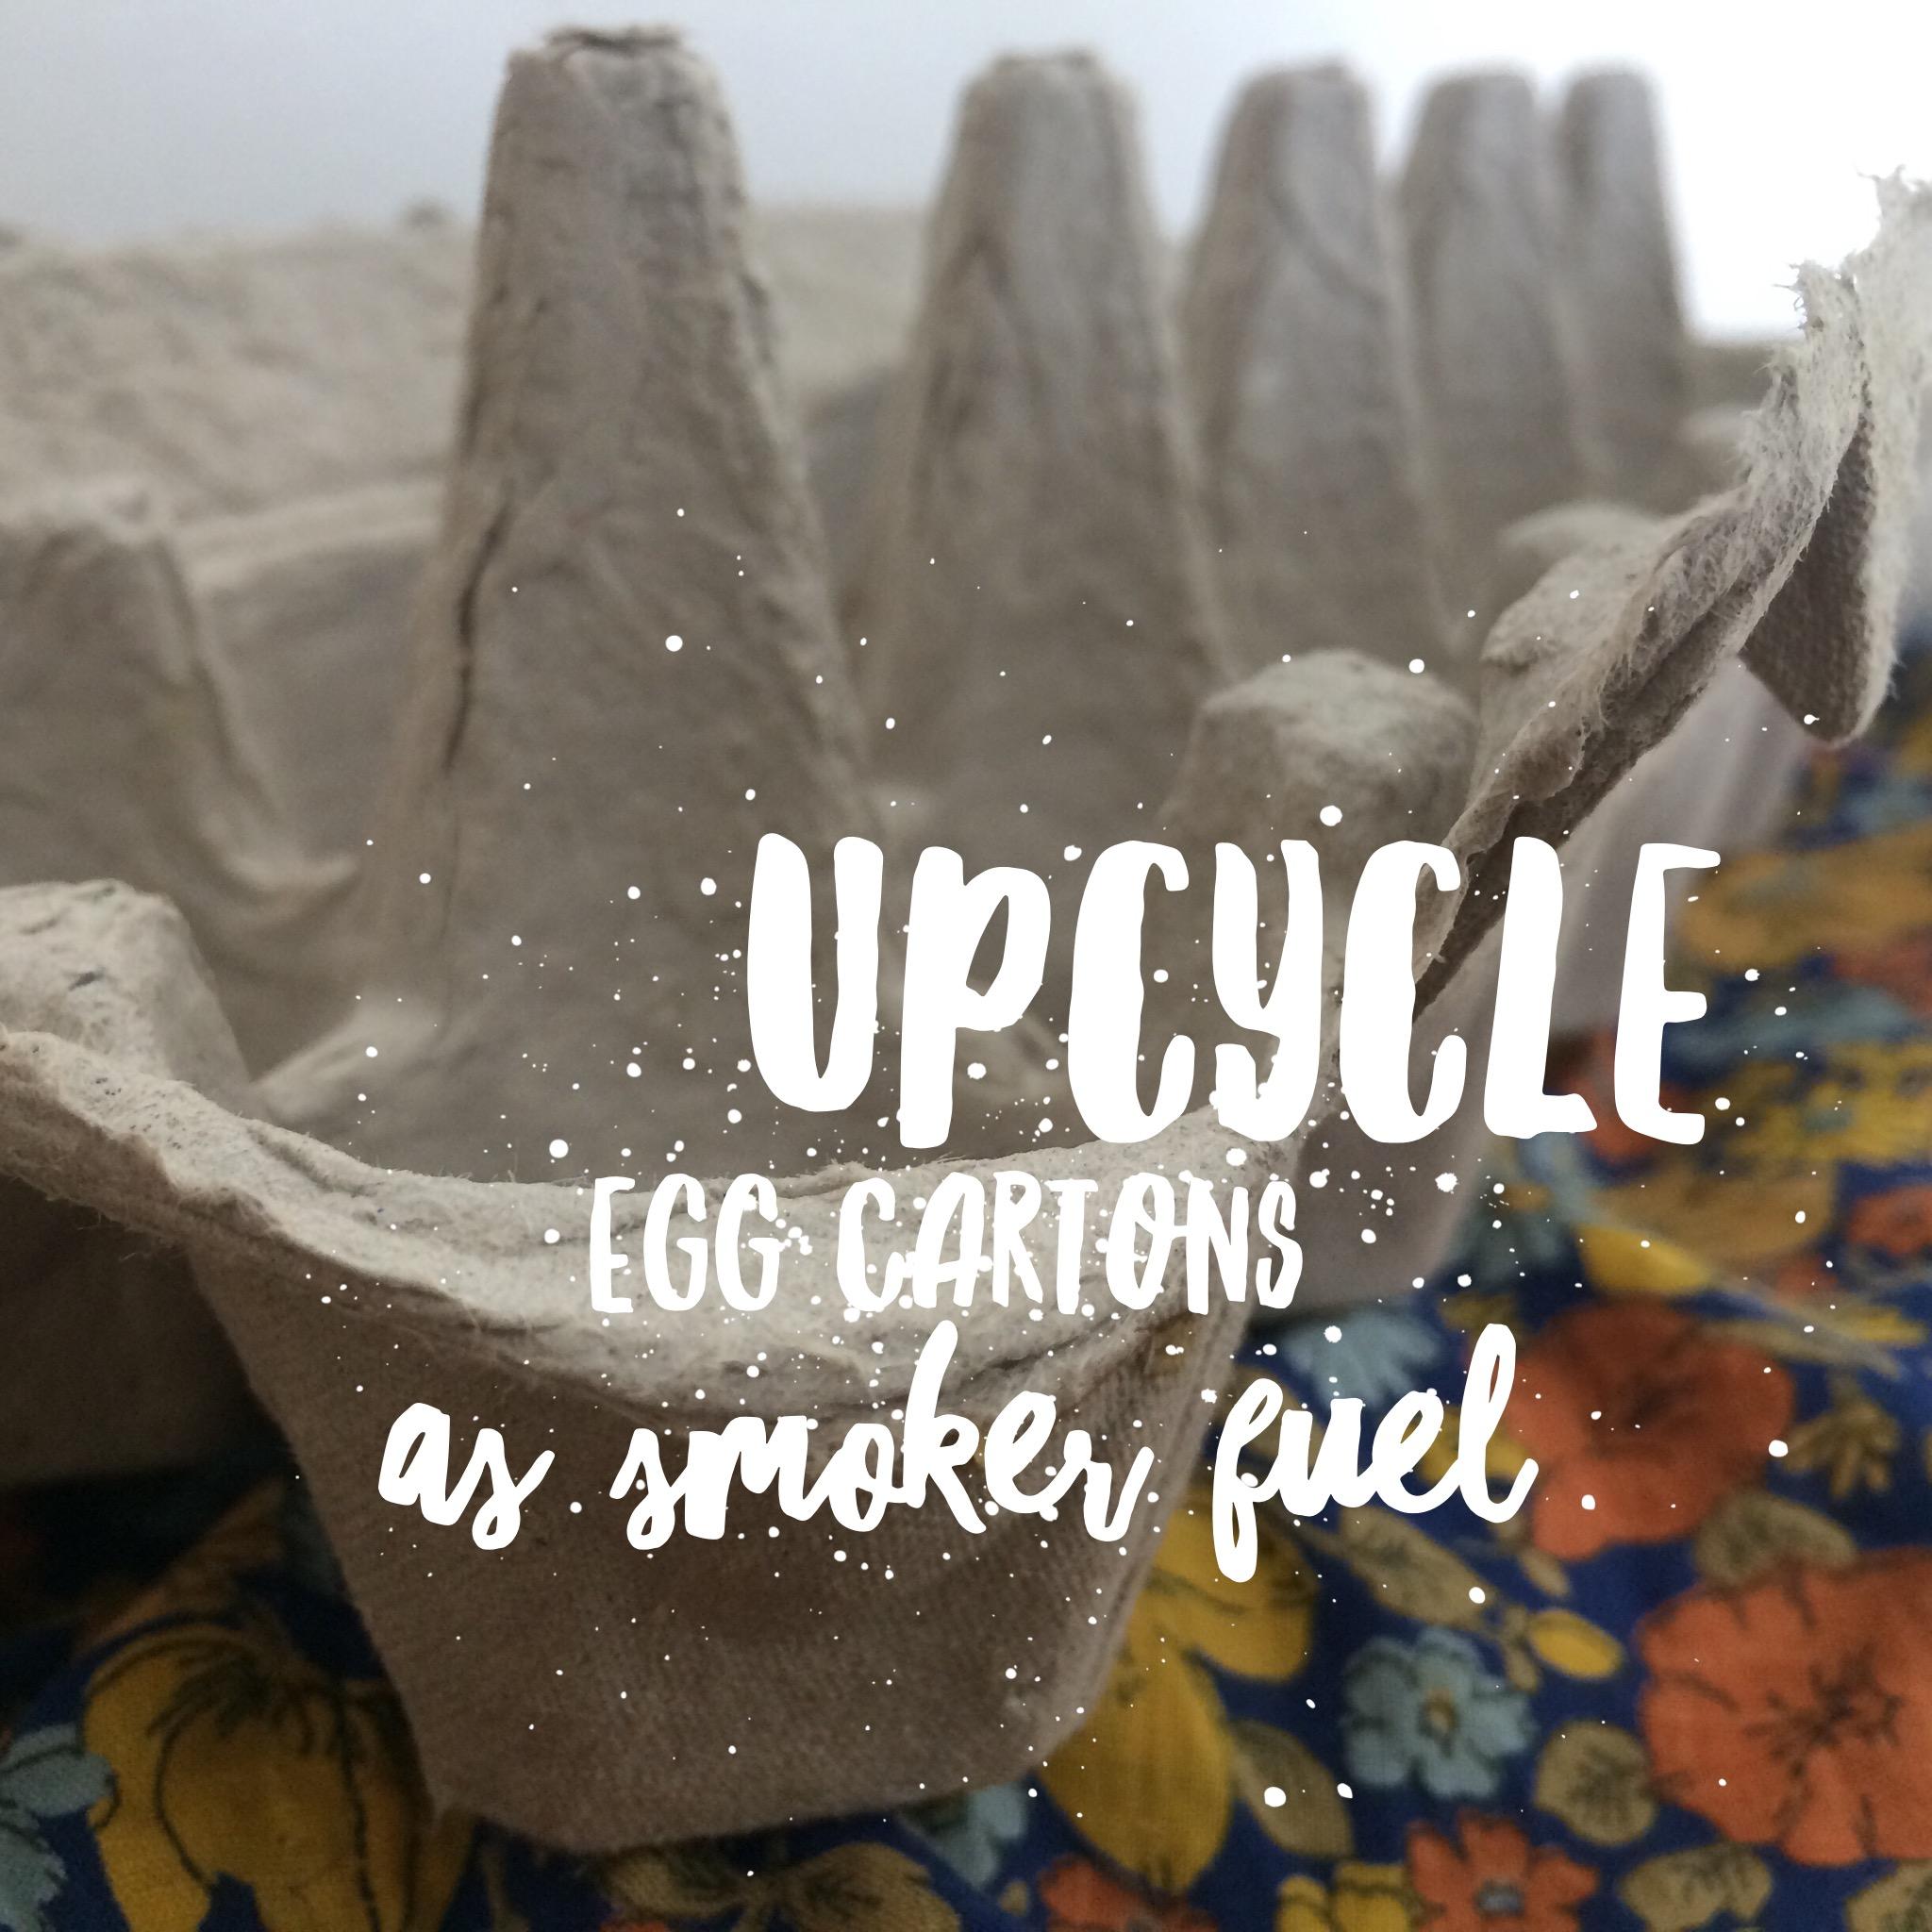 Beekeeping Lifehack: Egg Cartons as Smoker Fuel